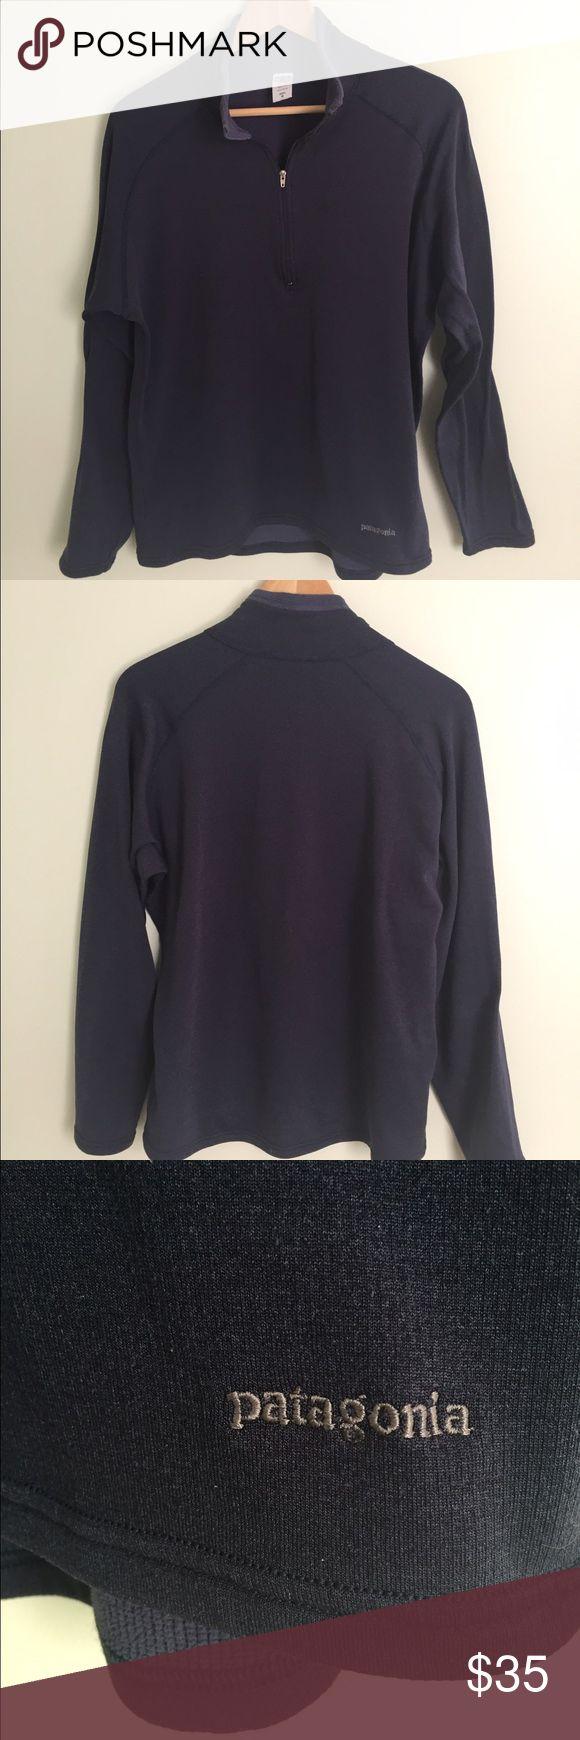 PATAGONIA Men's M Half Zip Navy This is a men's M half zip Patagonia shirt . Activewear. Navy Blue. Waffle weave texture inside. Patagonia Shirts Sweatshirts & Hoodies